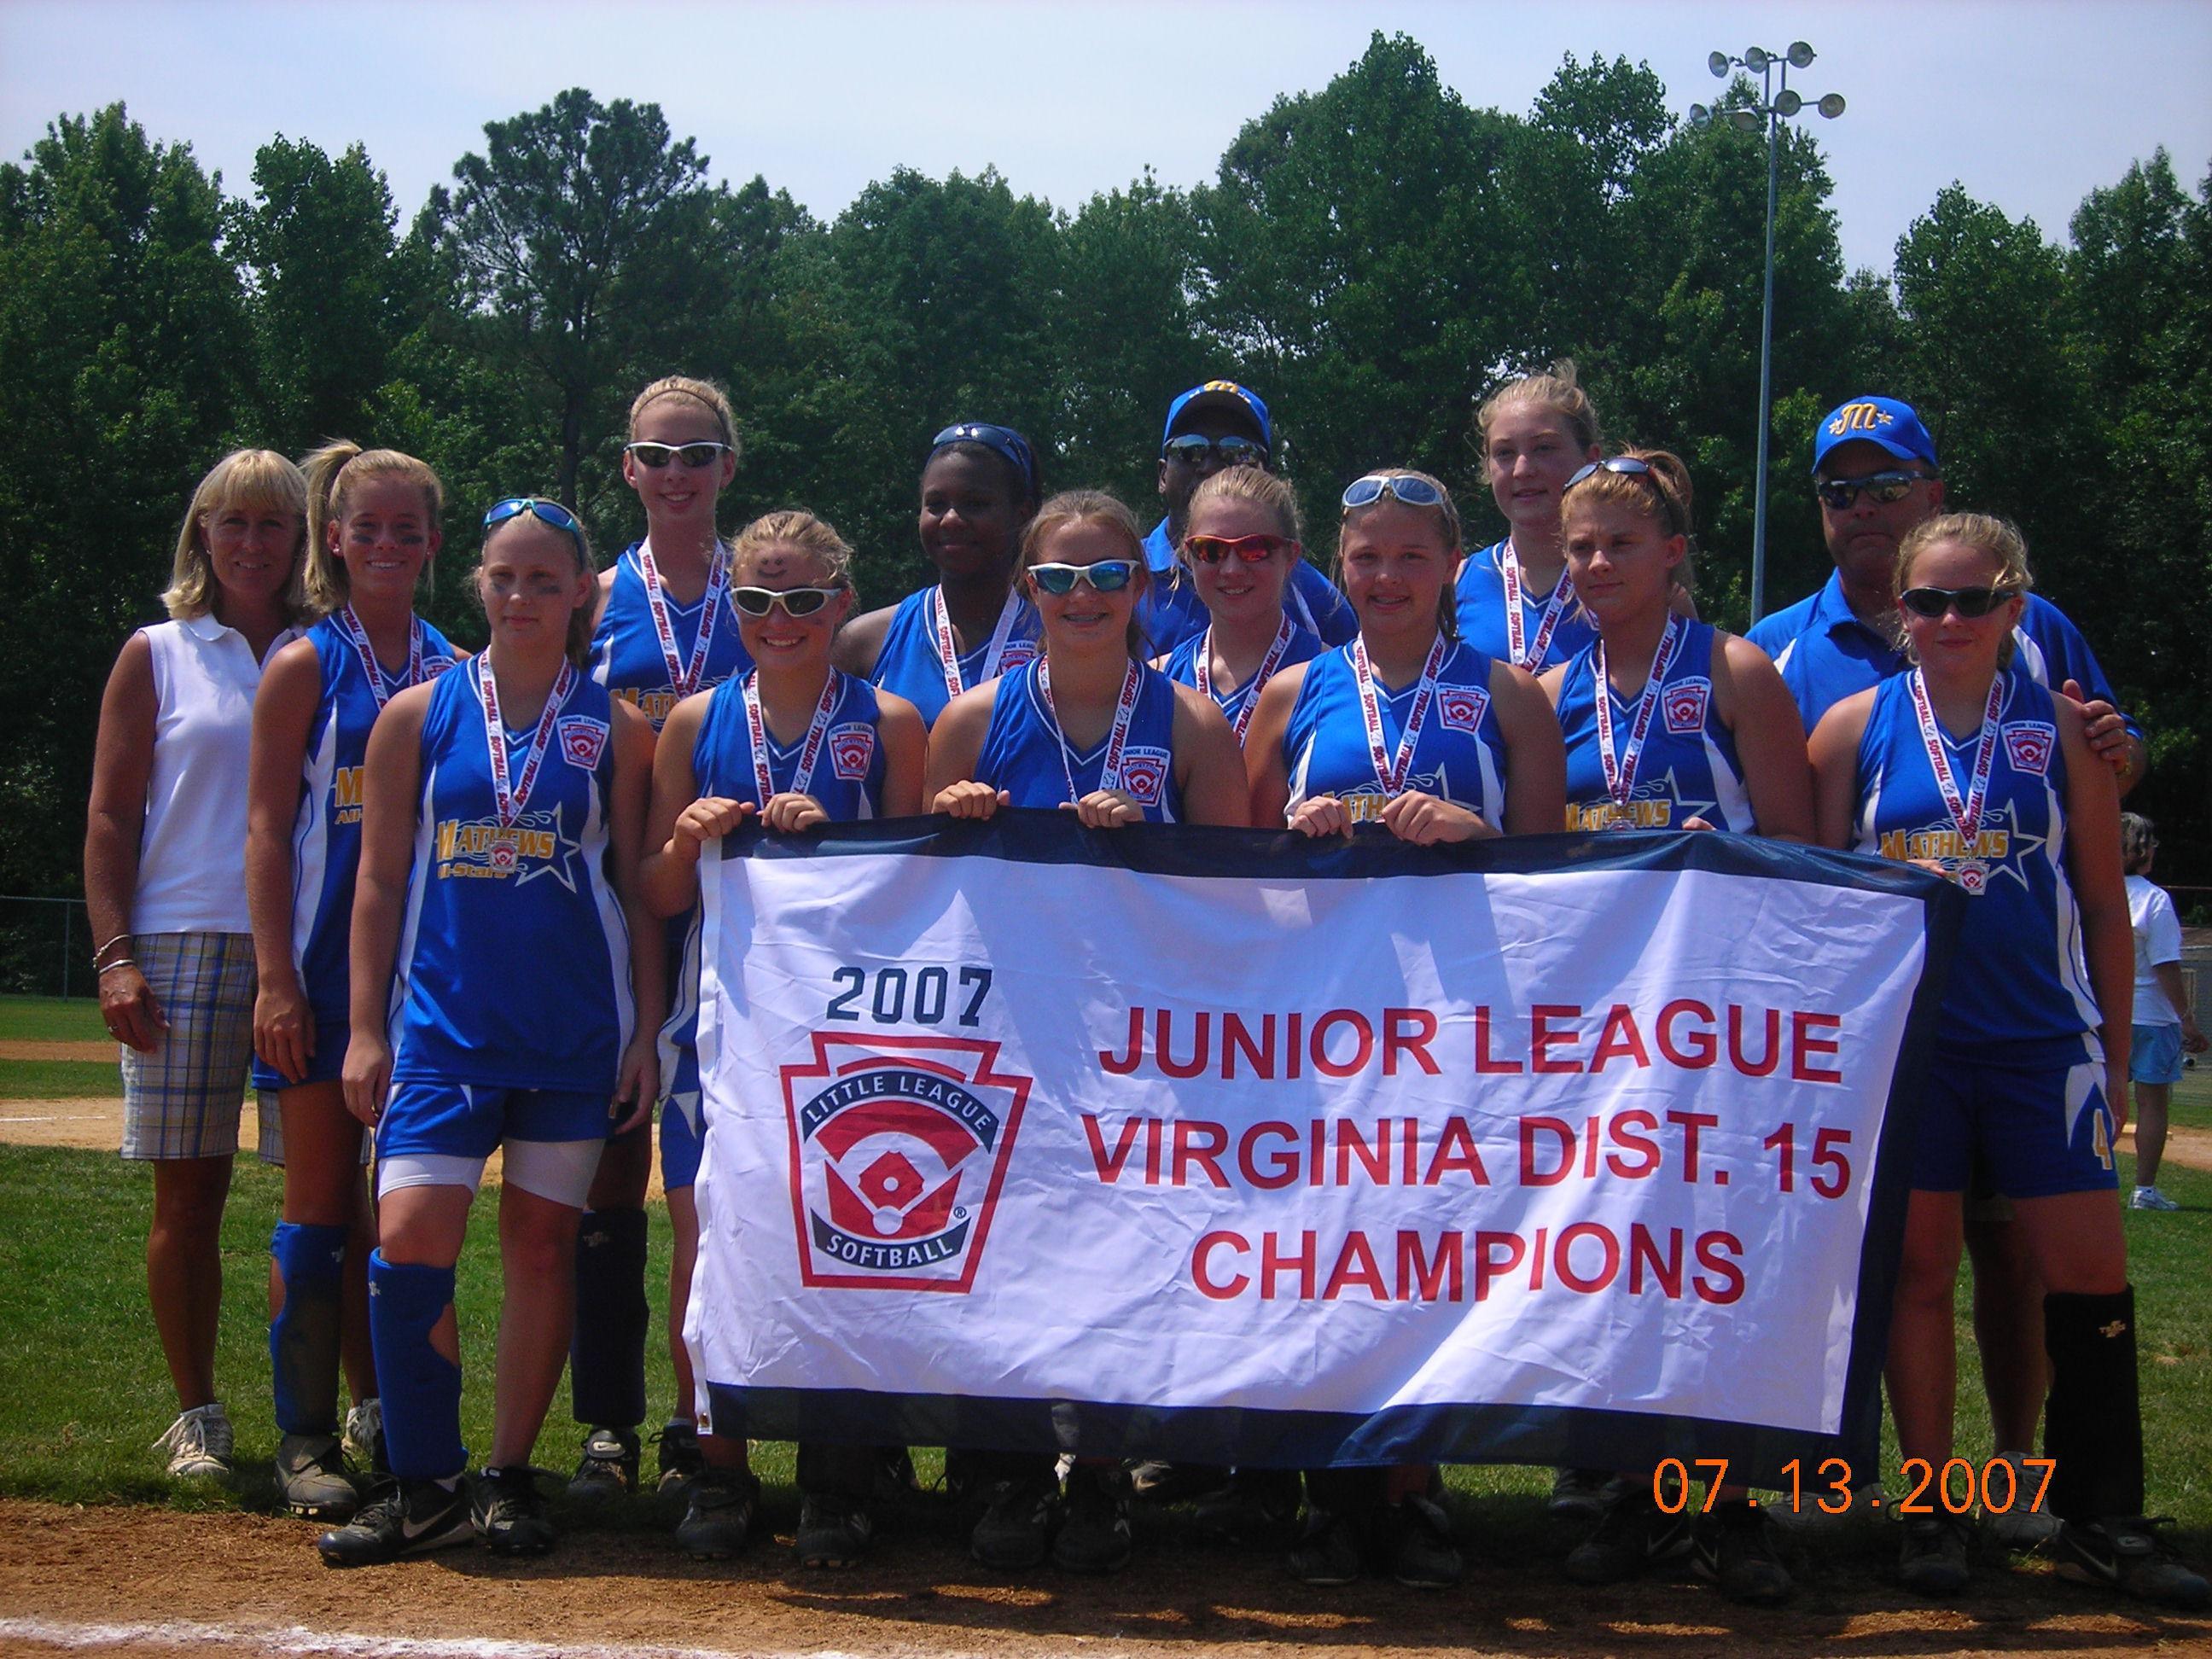 2007 Junior Softball Cahmpions